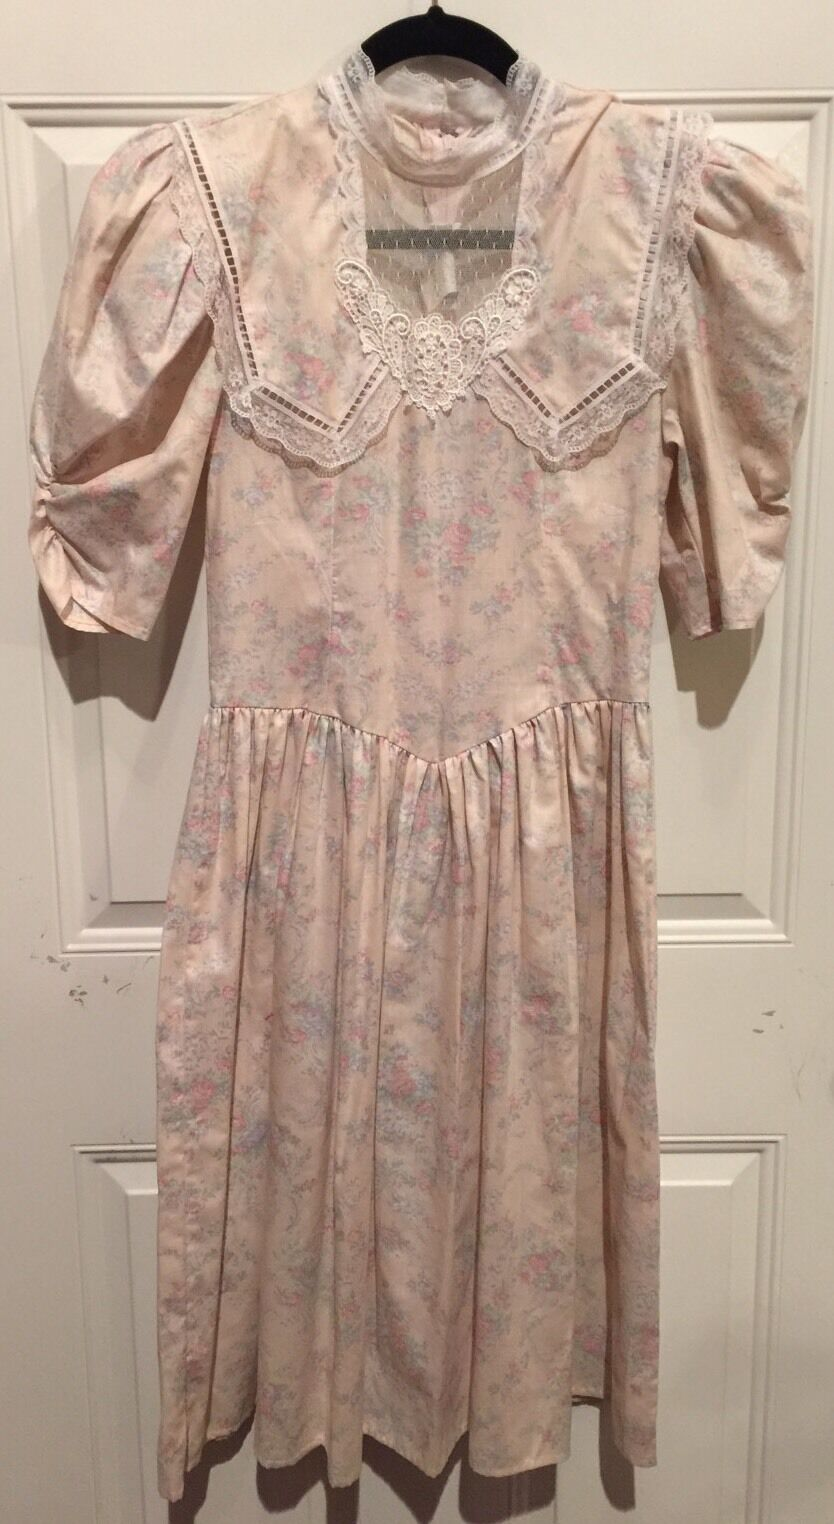 Vtg 70s Gunne Sax Dress Boho Conservative Wedding Floral Lace Hippie Mint Size 8